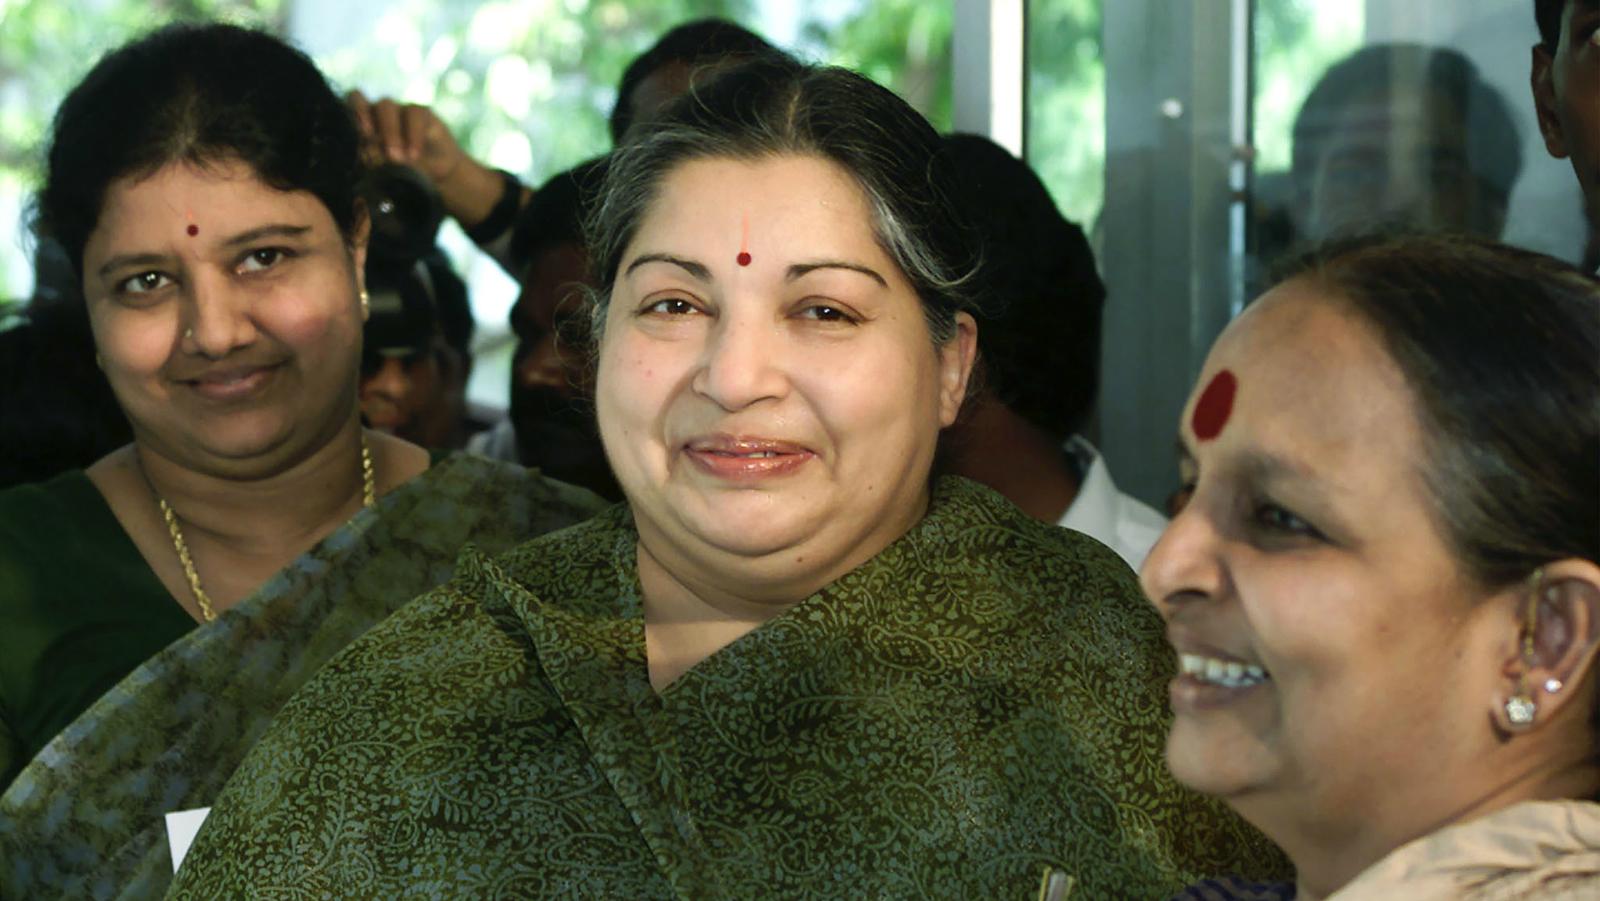 Sasikala Natarajan-Jayalalithaa-Tamil Nadu